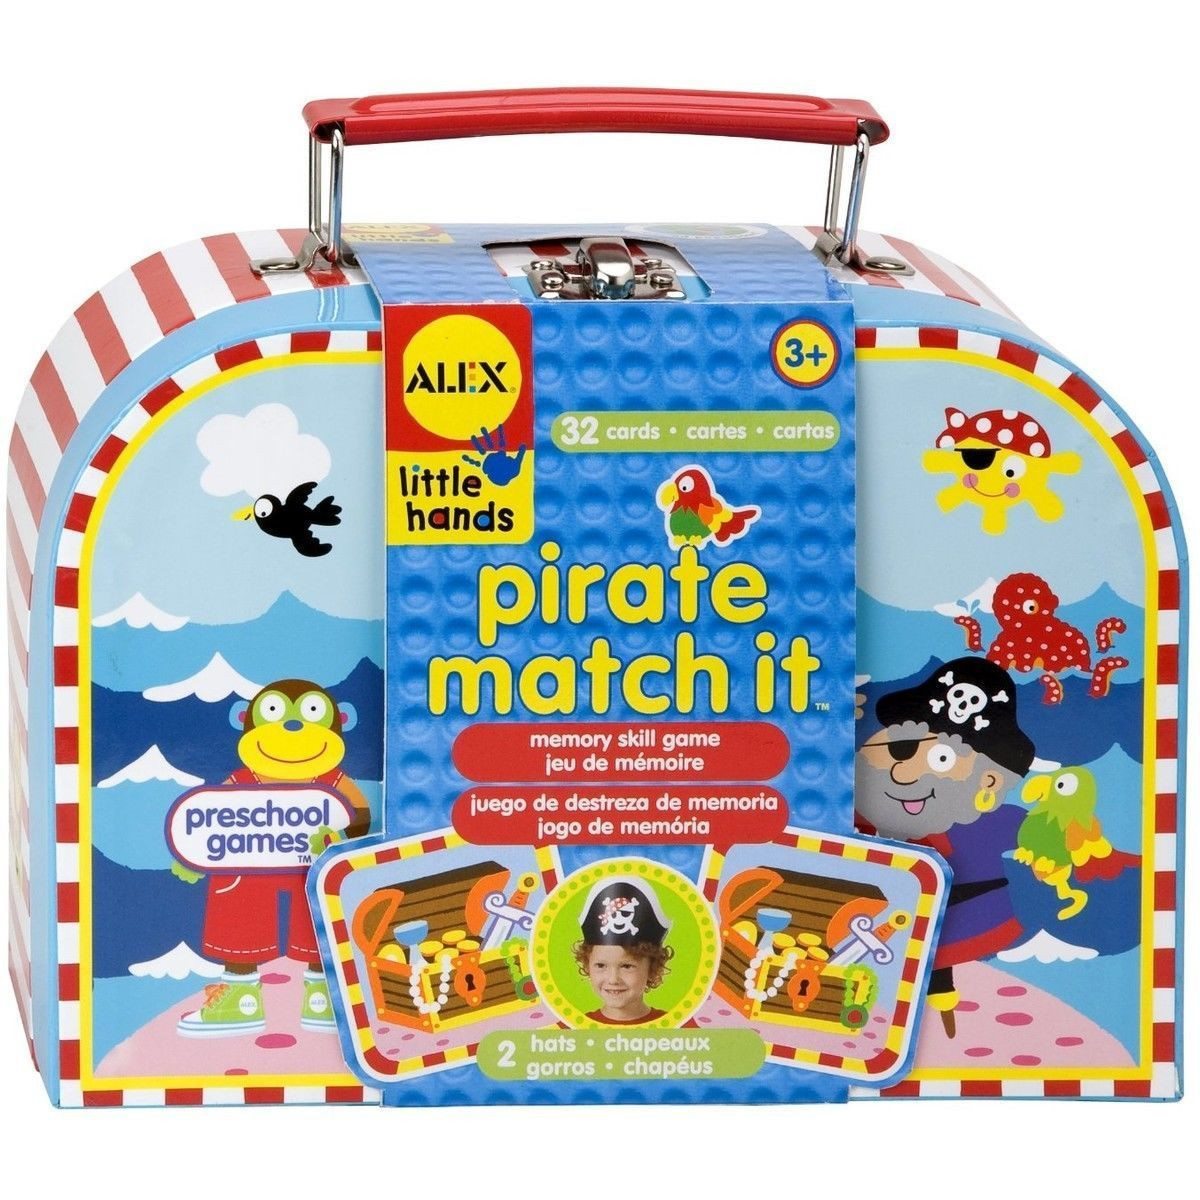 Pirate Matching Game S Eenanttoysonline